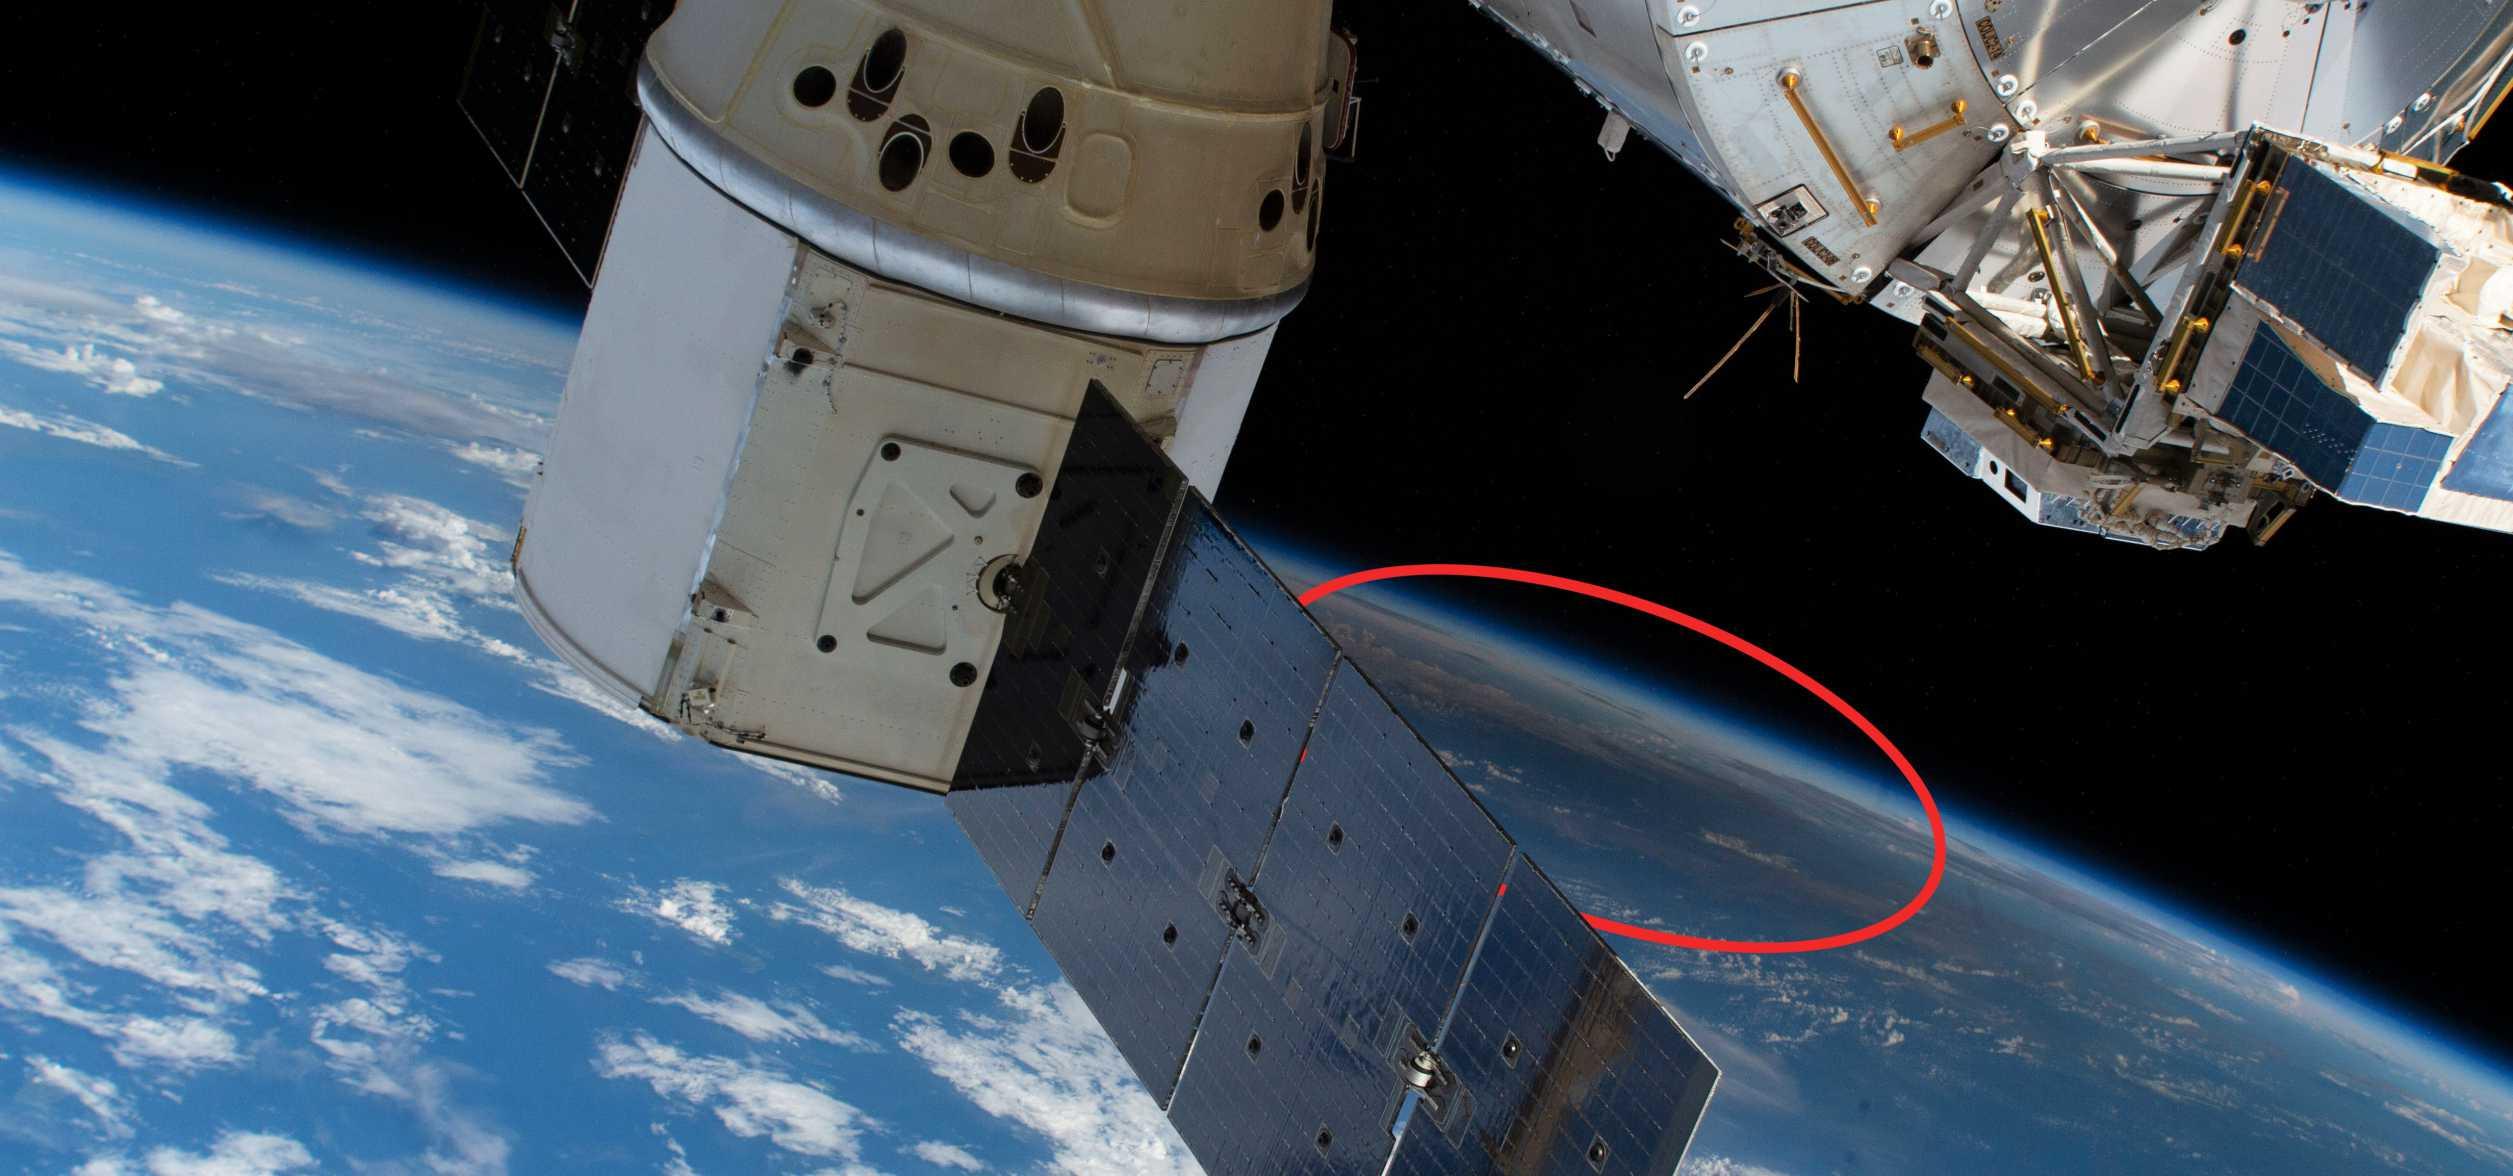 CRS-19 Cargo Dragon C106 ISS 122619 (NASA) eclipse 1 circle (c)